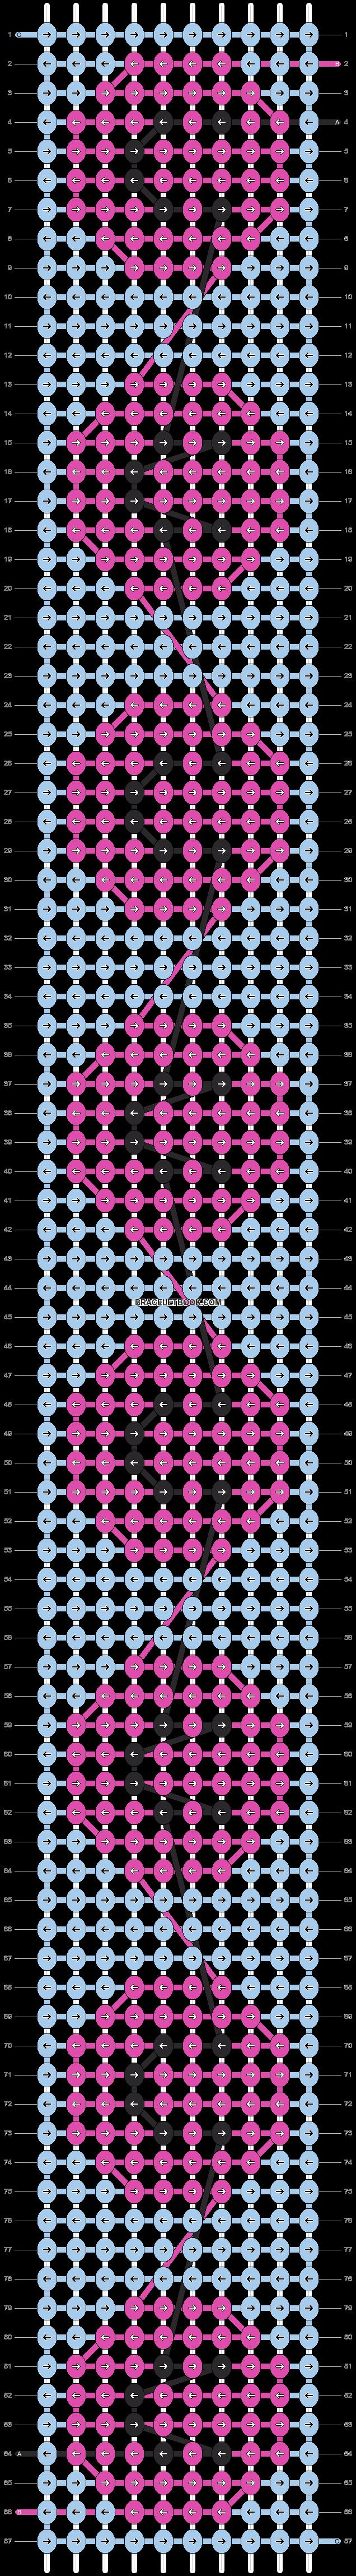 Alpha pattern #86446 variation #156348 pattern